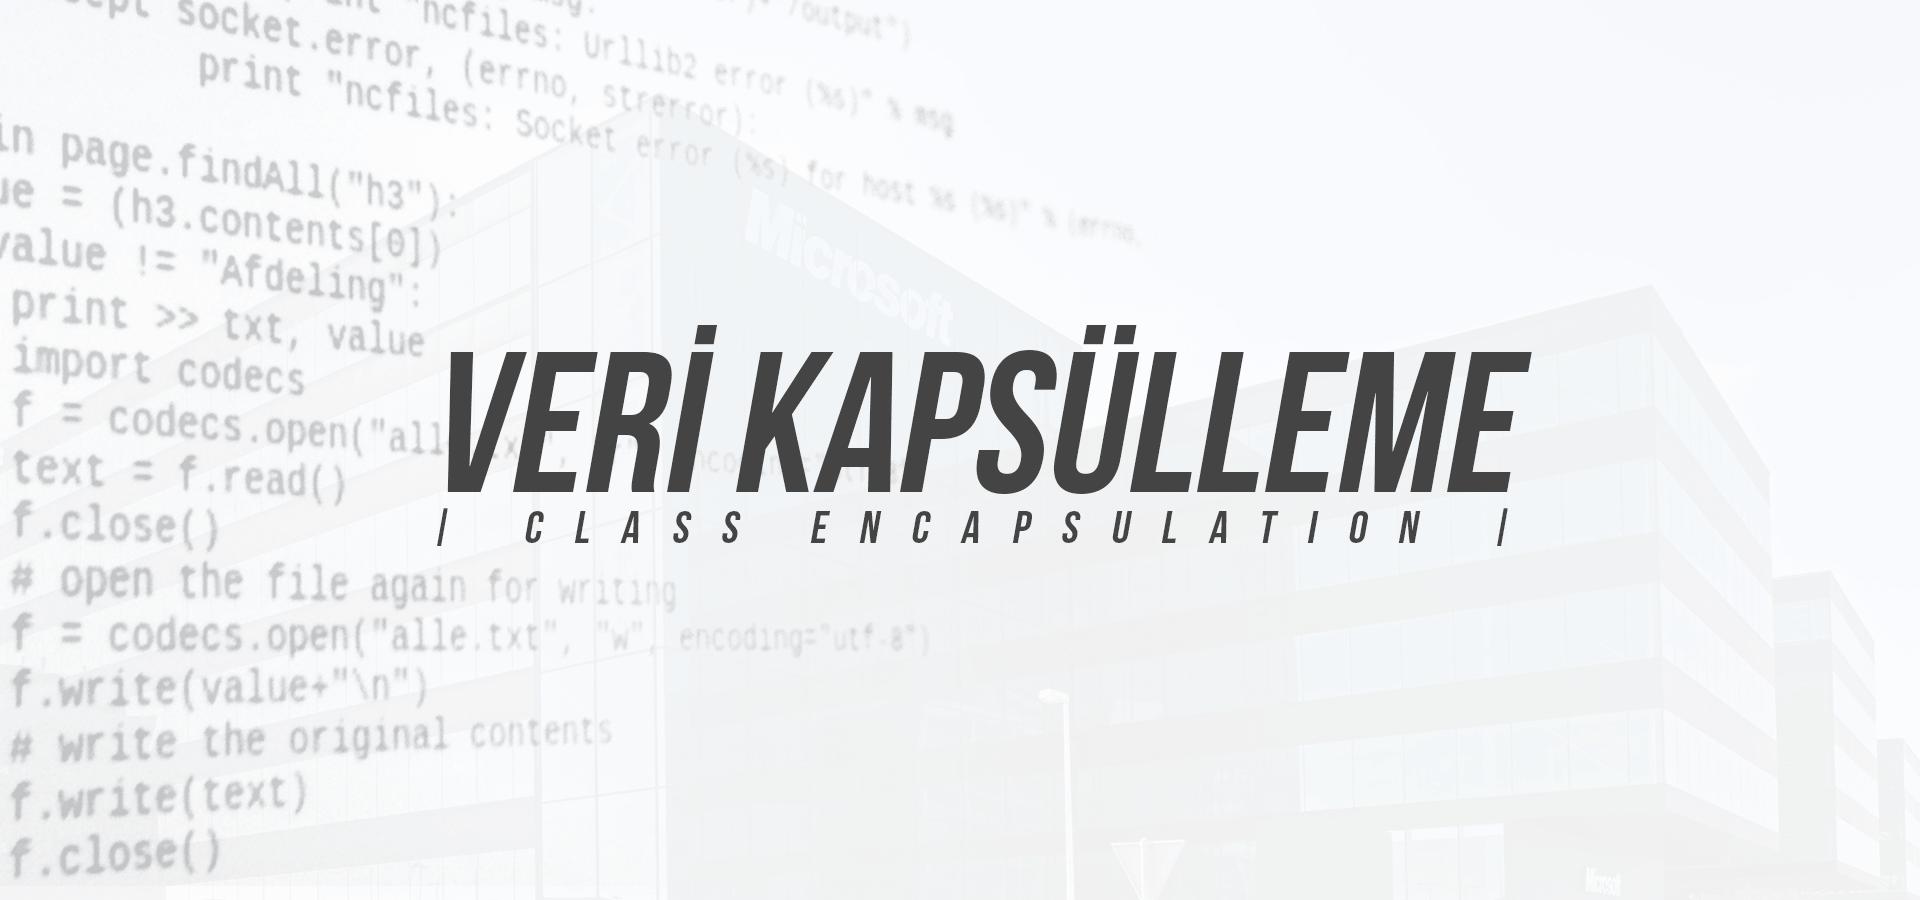 C# Veri Kapsülleme (Class Encapsulation) {Get/Set Mevzuları}